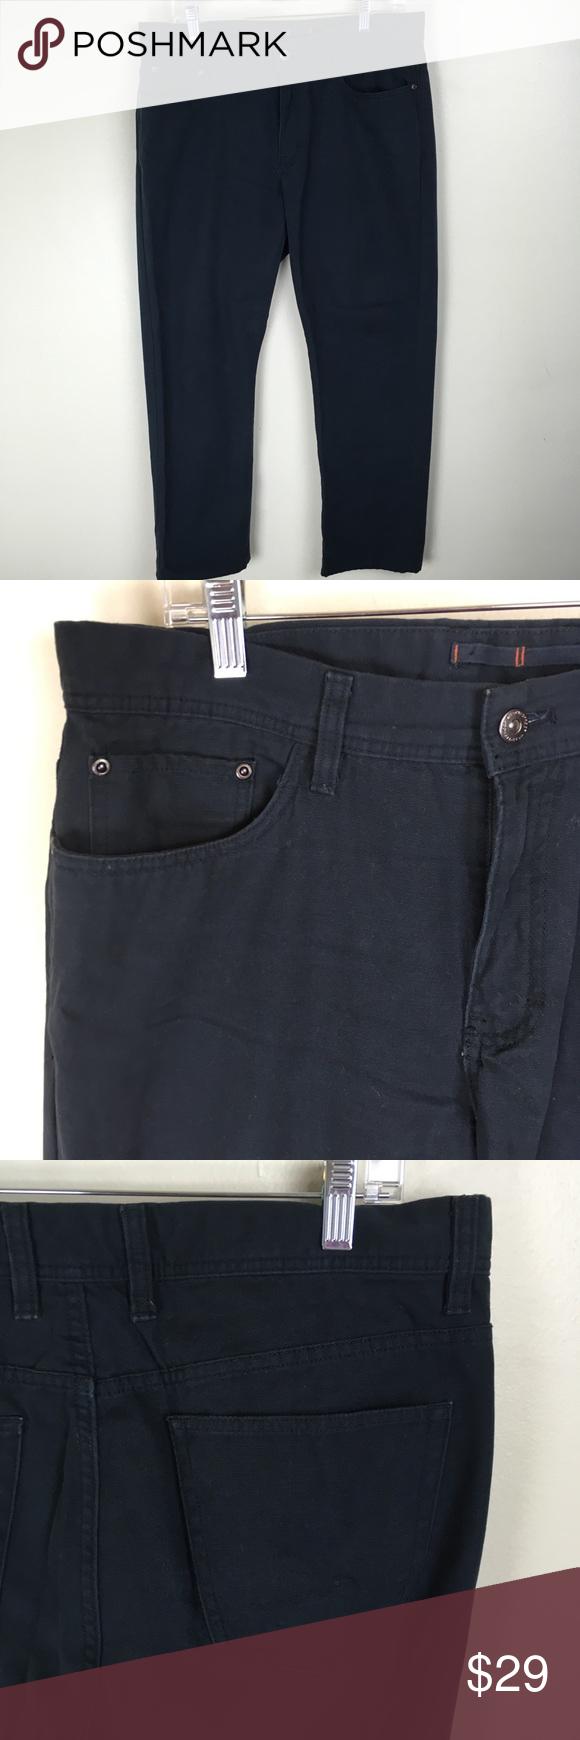 7cca32bdbdf8 Weatherproof 34x30 Cotton Canvas Work Jeans Pants WP Weatherproof Vintage  quality cotton canvas 5 pocket jean